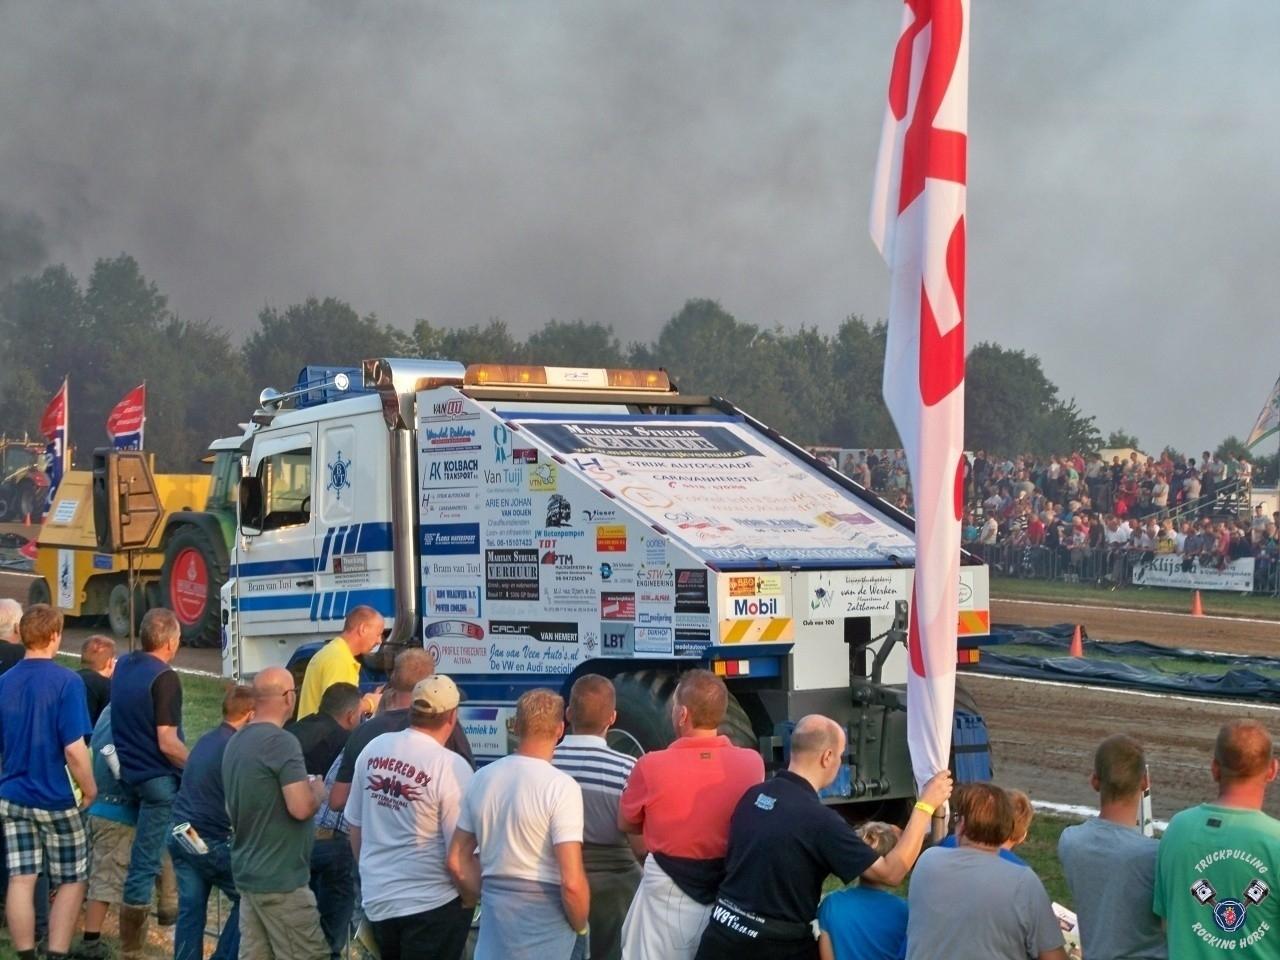 almkerk-2013-010